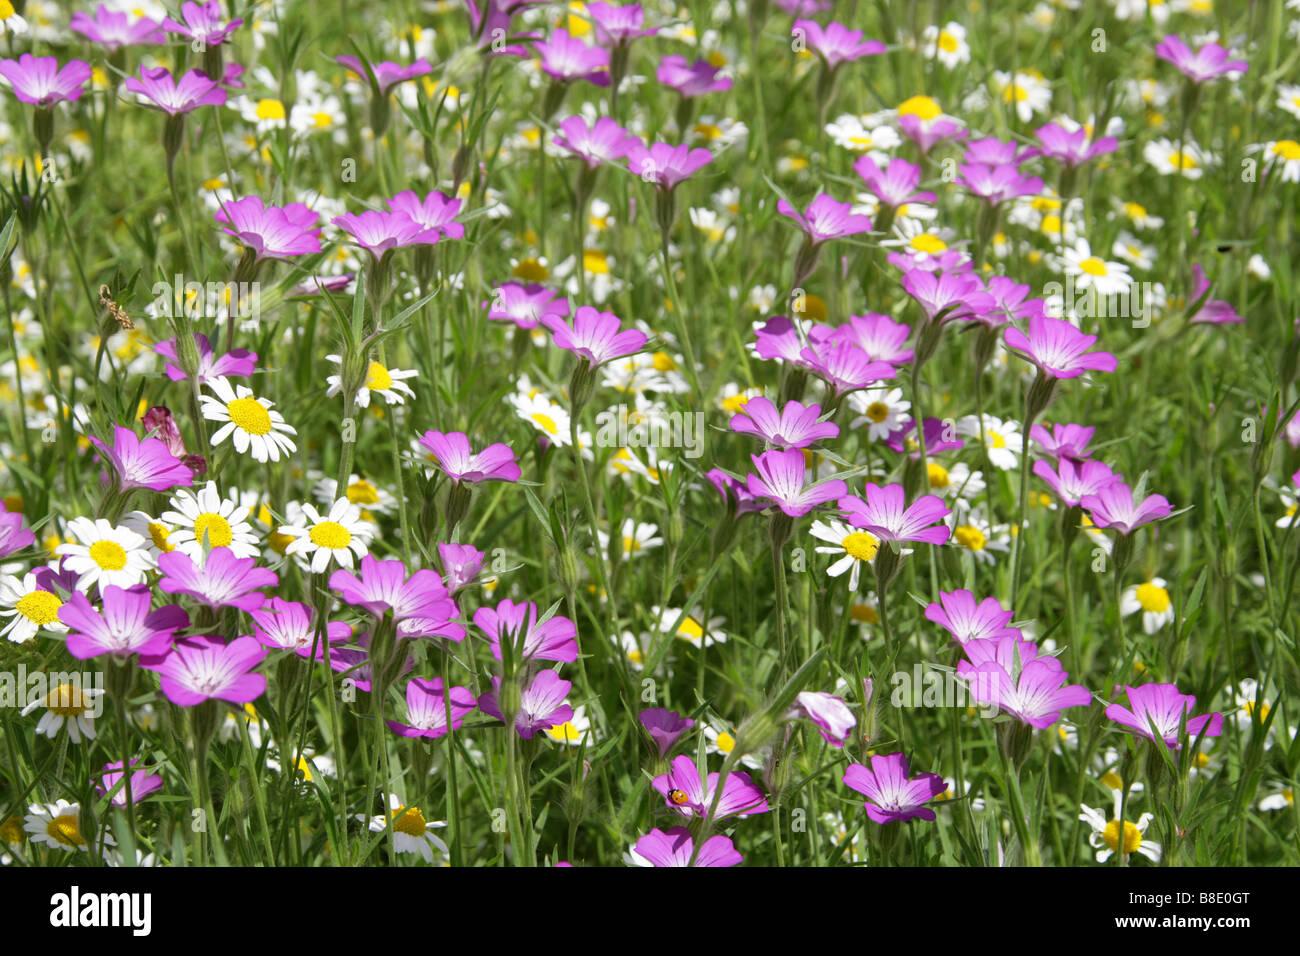 Agrostemma githago maíz, berberechos, Caryophyllaceae y margaritas de Ojo de Buey Chryanthemum leucanthemum Foto de stock